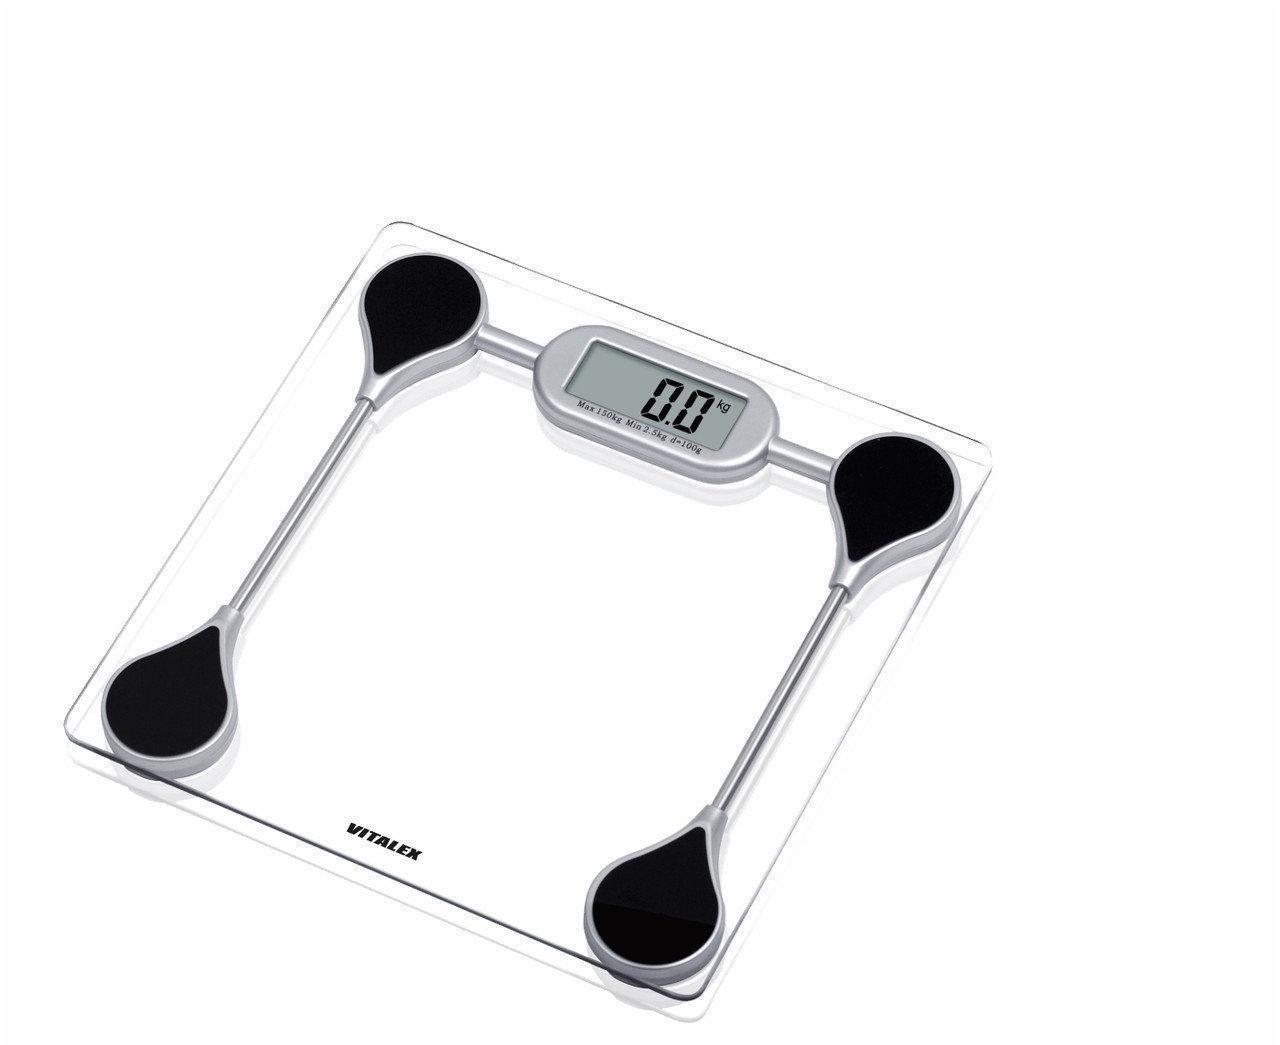 Весы напольные Vitalex VT-200, весы электронные, весы напольные электронные до 150 кг